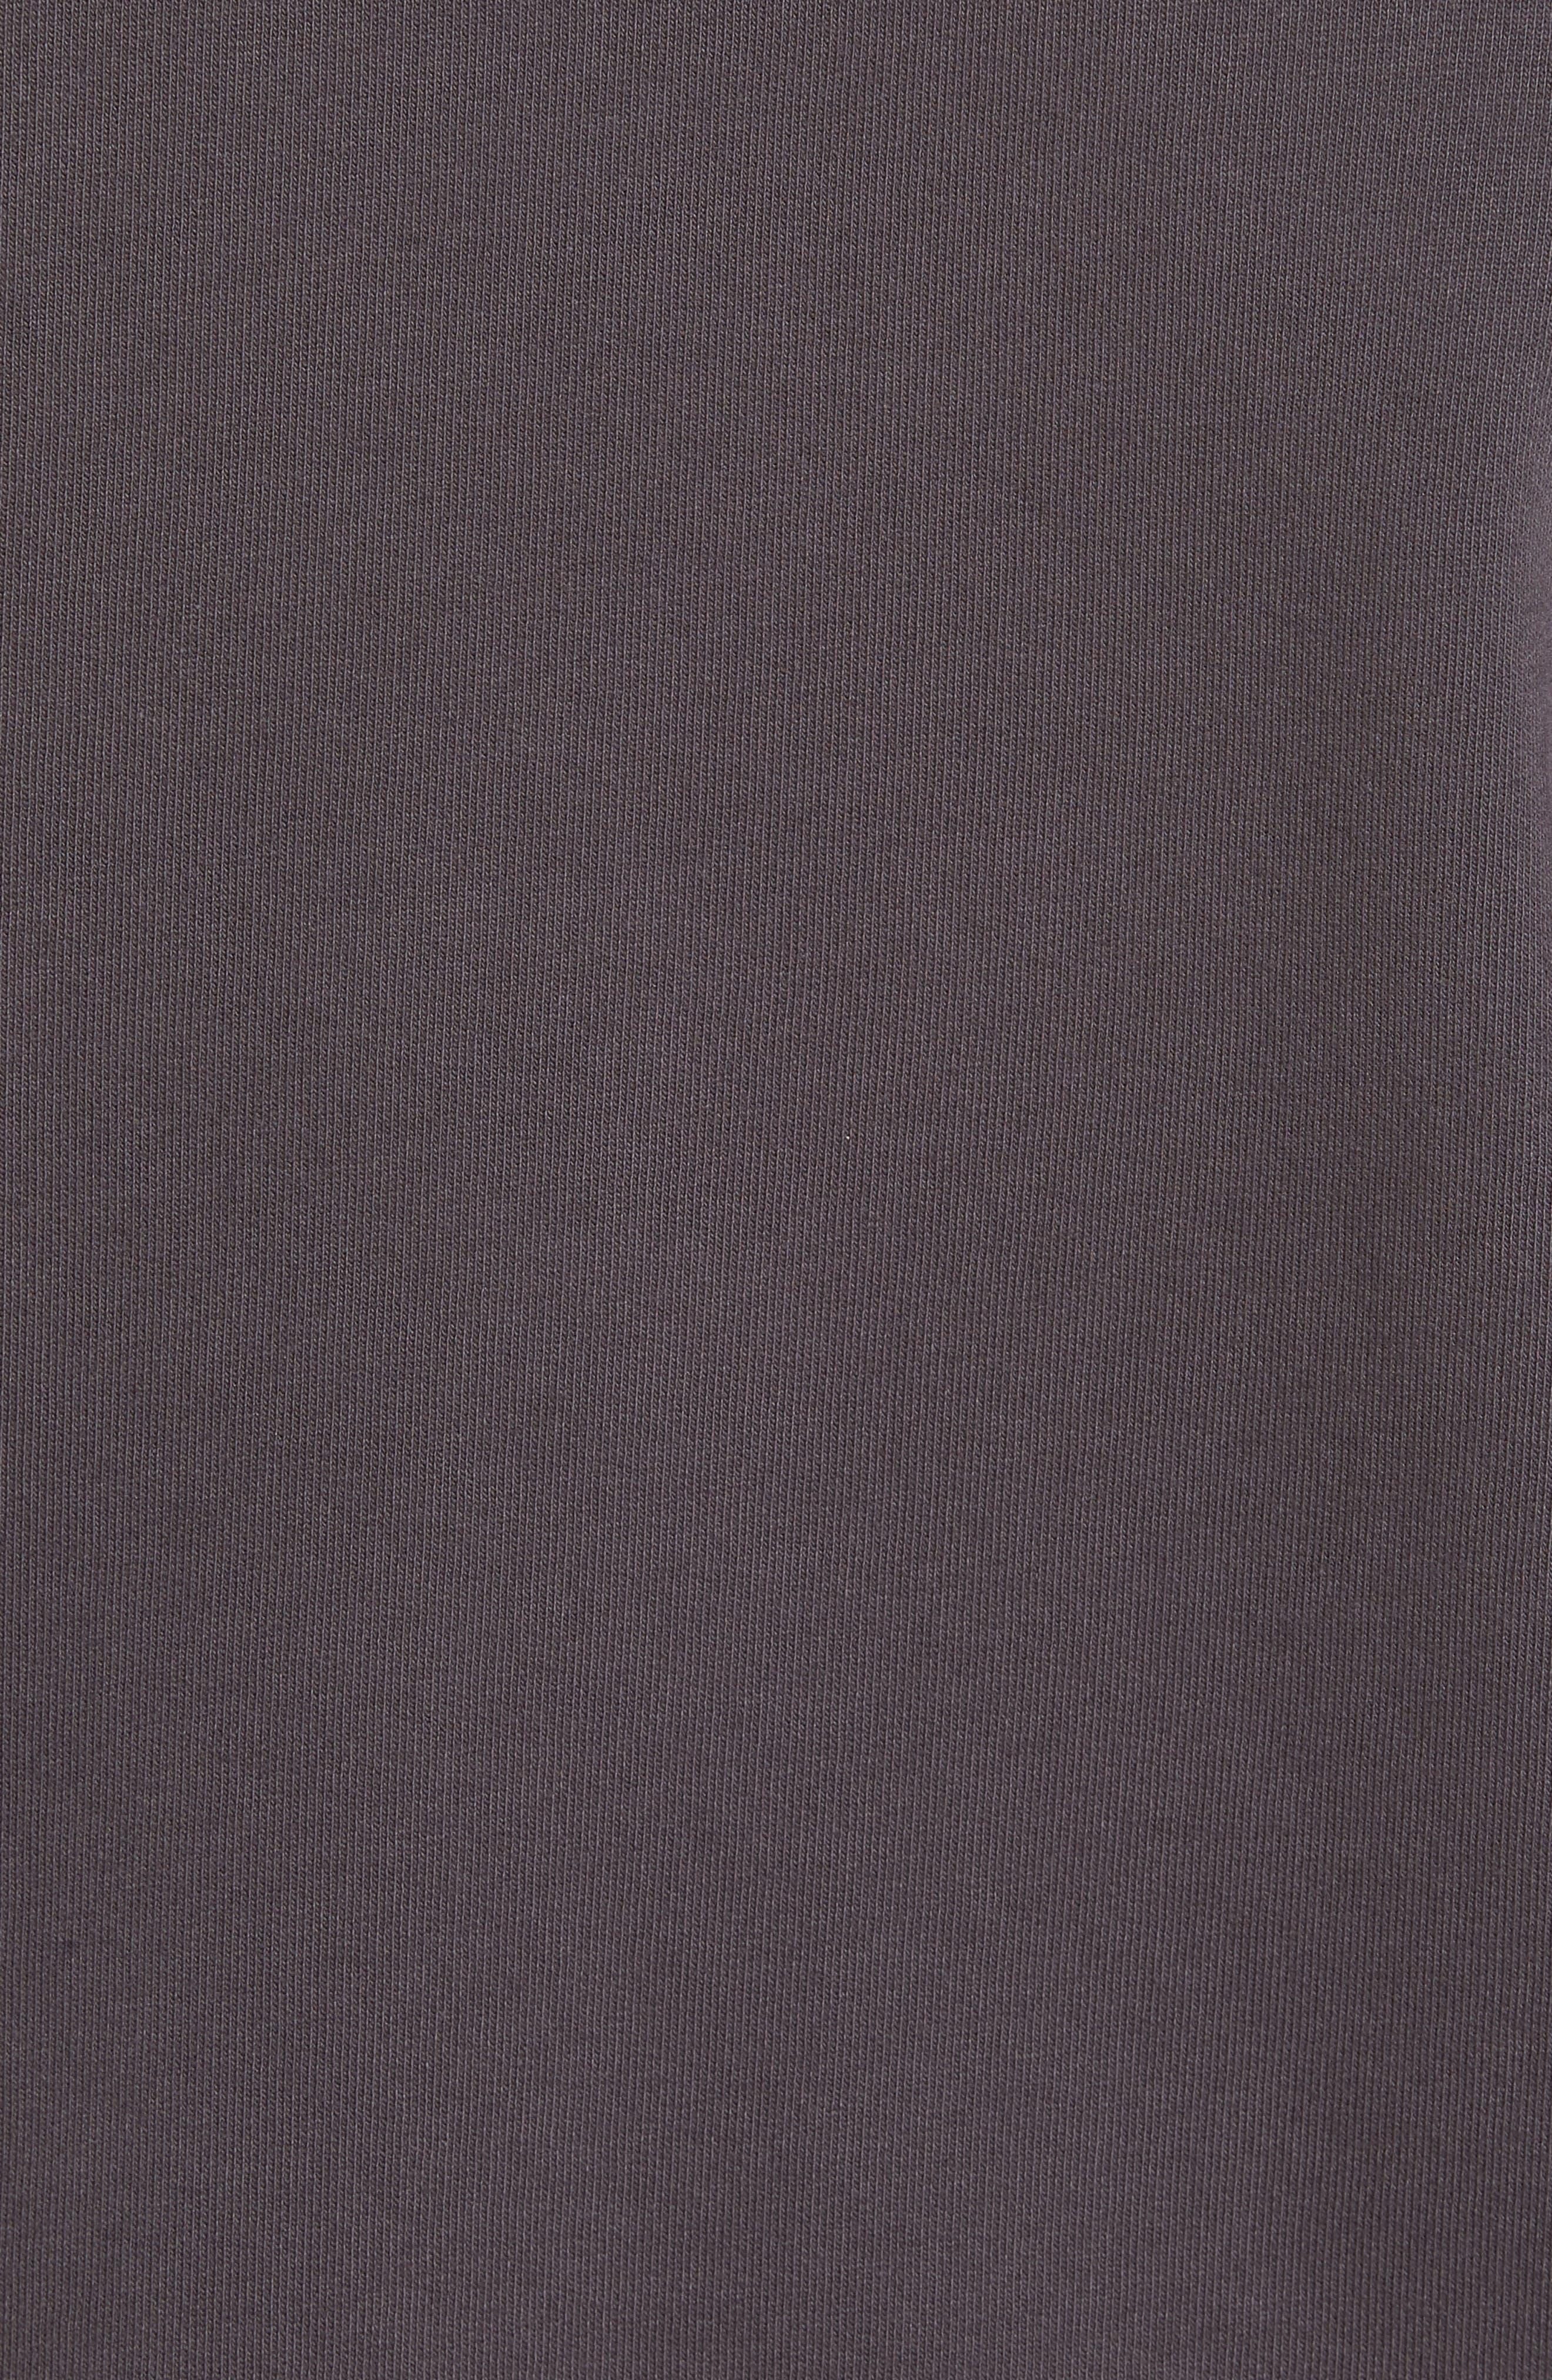 Tyson Slim Fit Sweatshirt,                             Alternate thumbnail 5, color,                             022